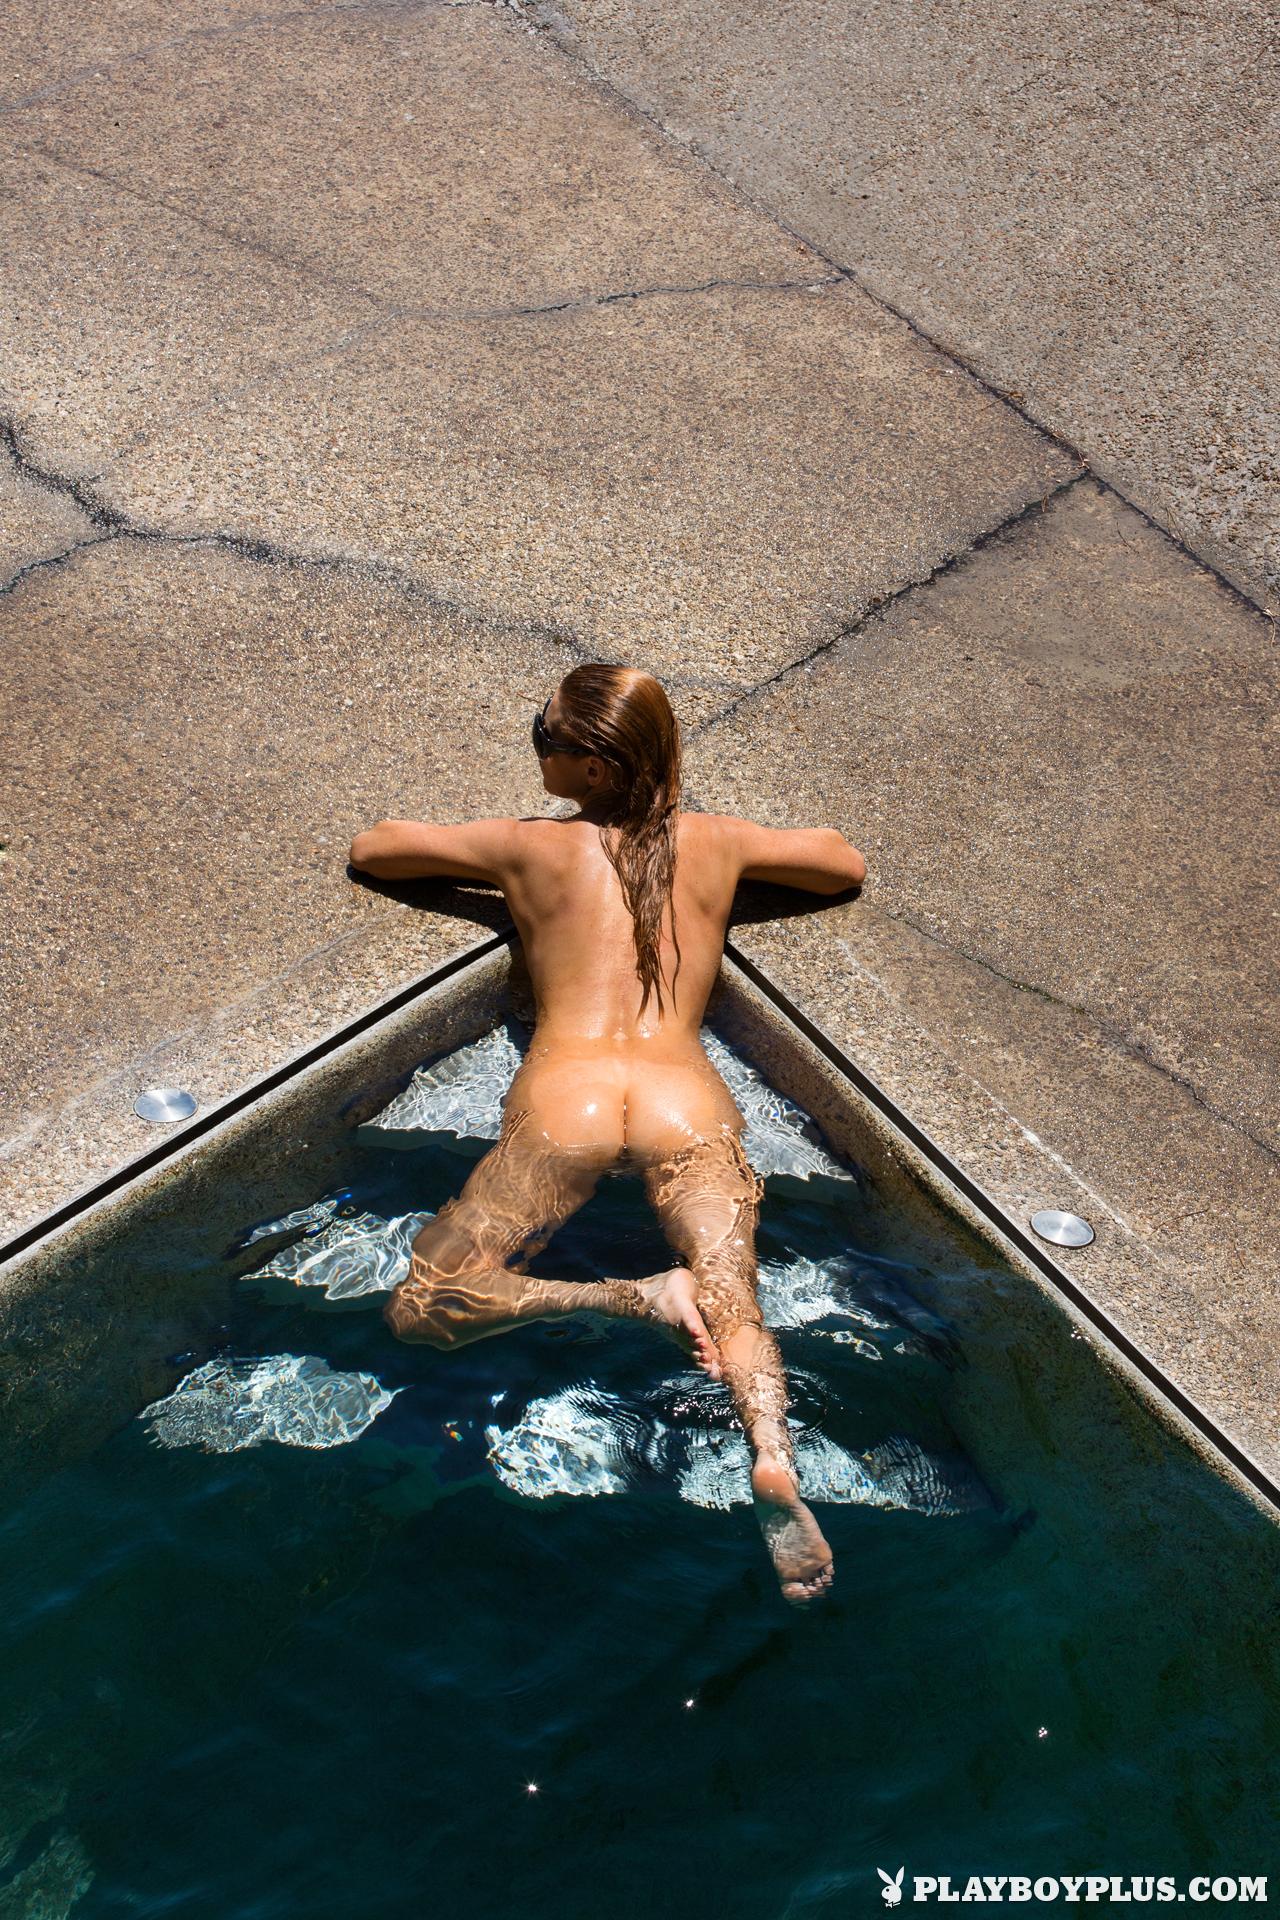 gia-marie-pool-wet-naked-sunglasses-playboy-15